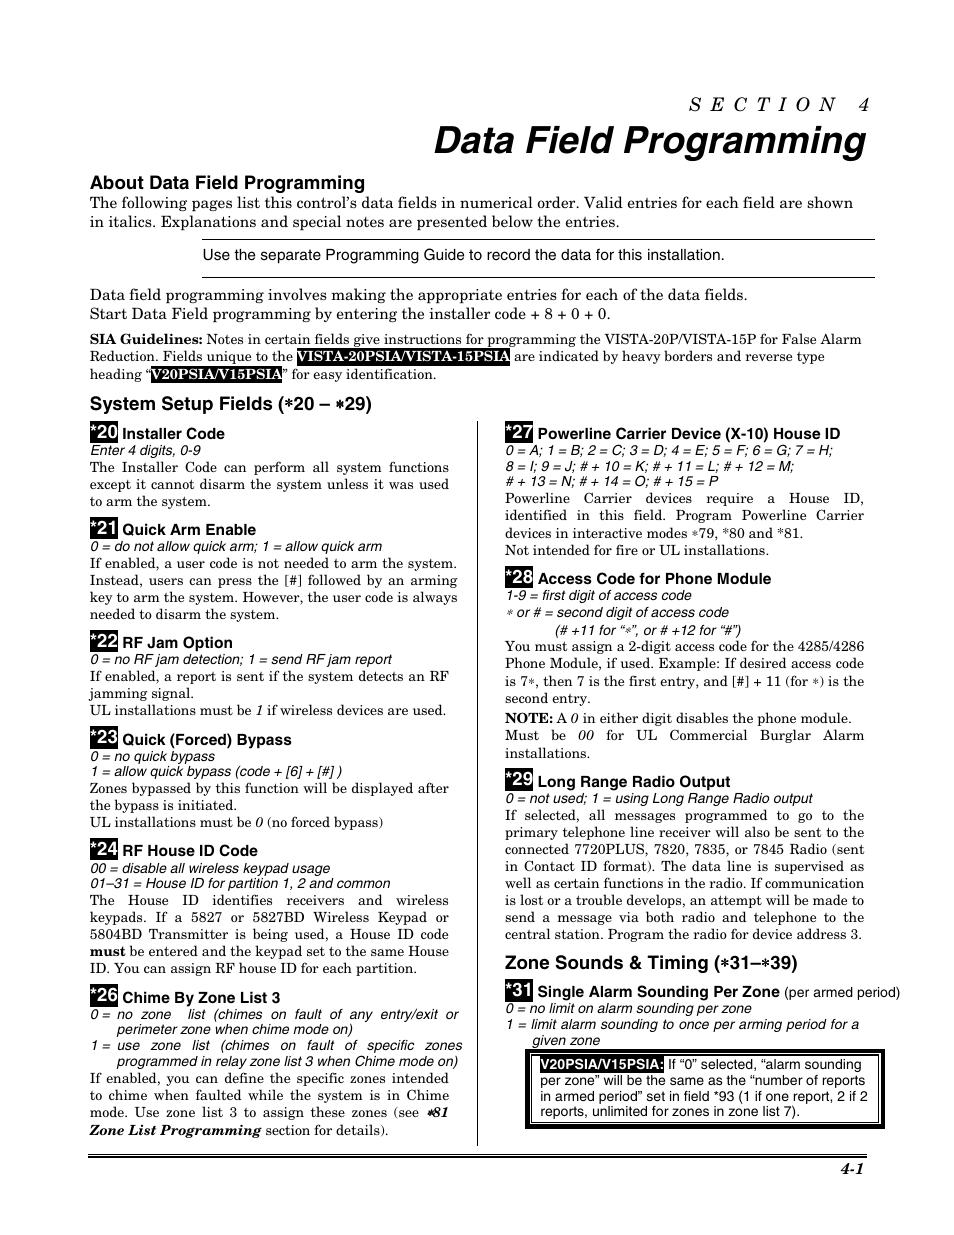 Data field programming, About data field programming | Honeywell VISTA-20P  User Manual |